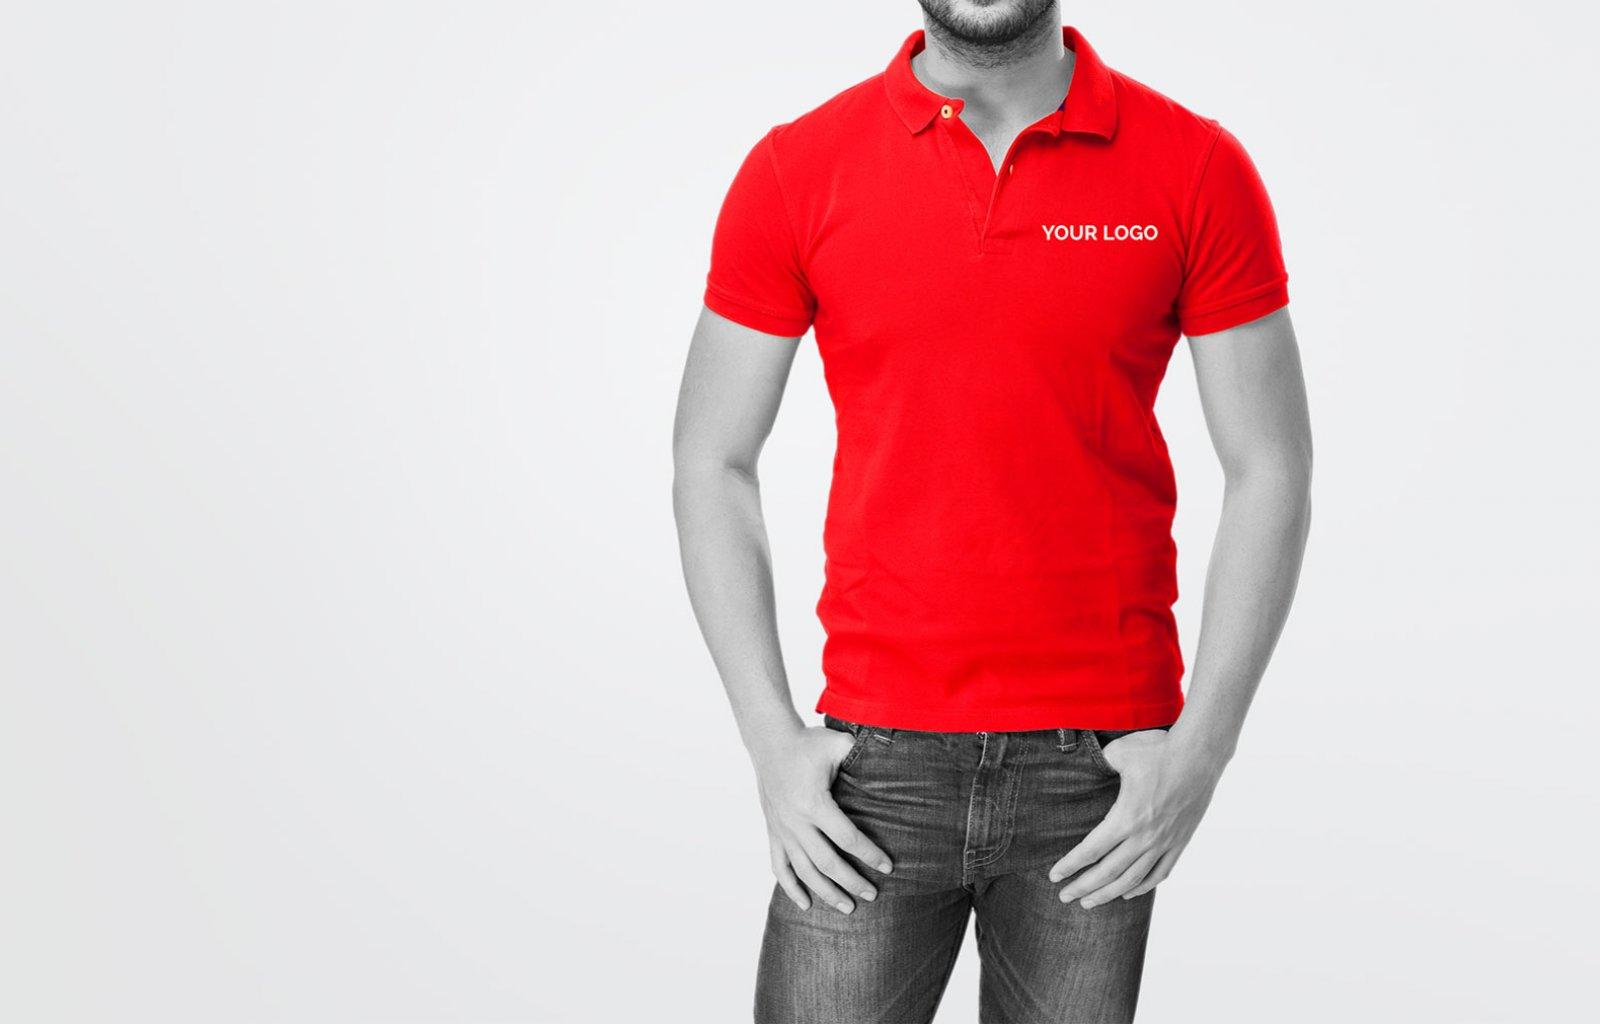 corporate tshirts